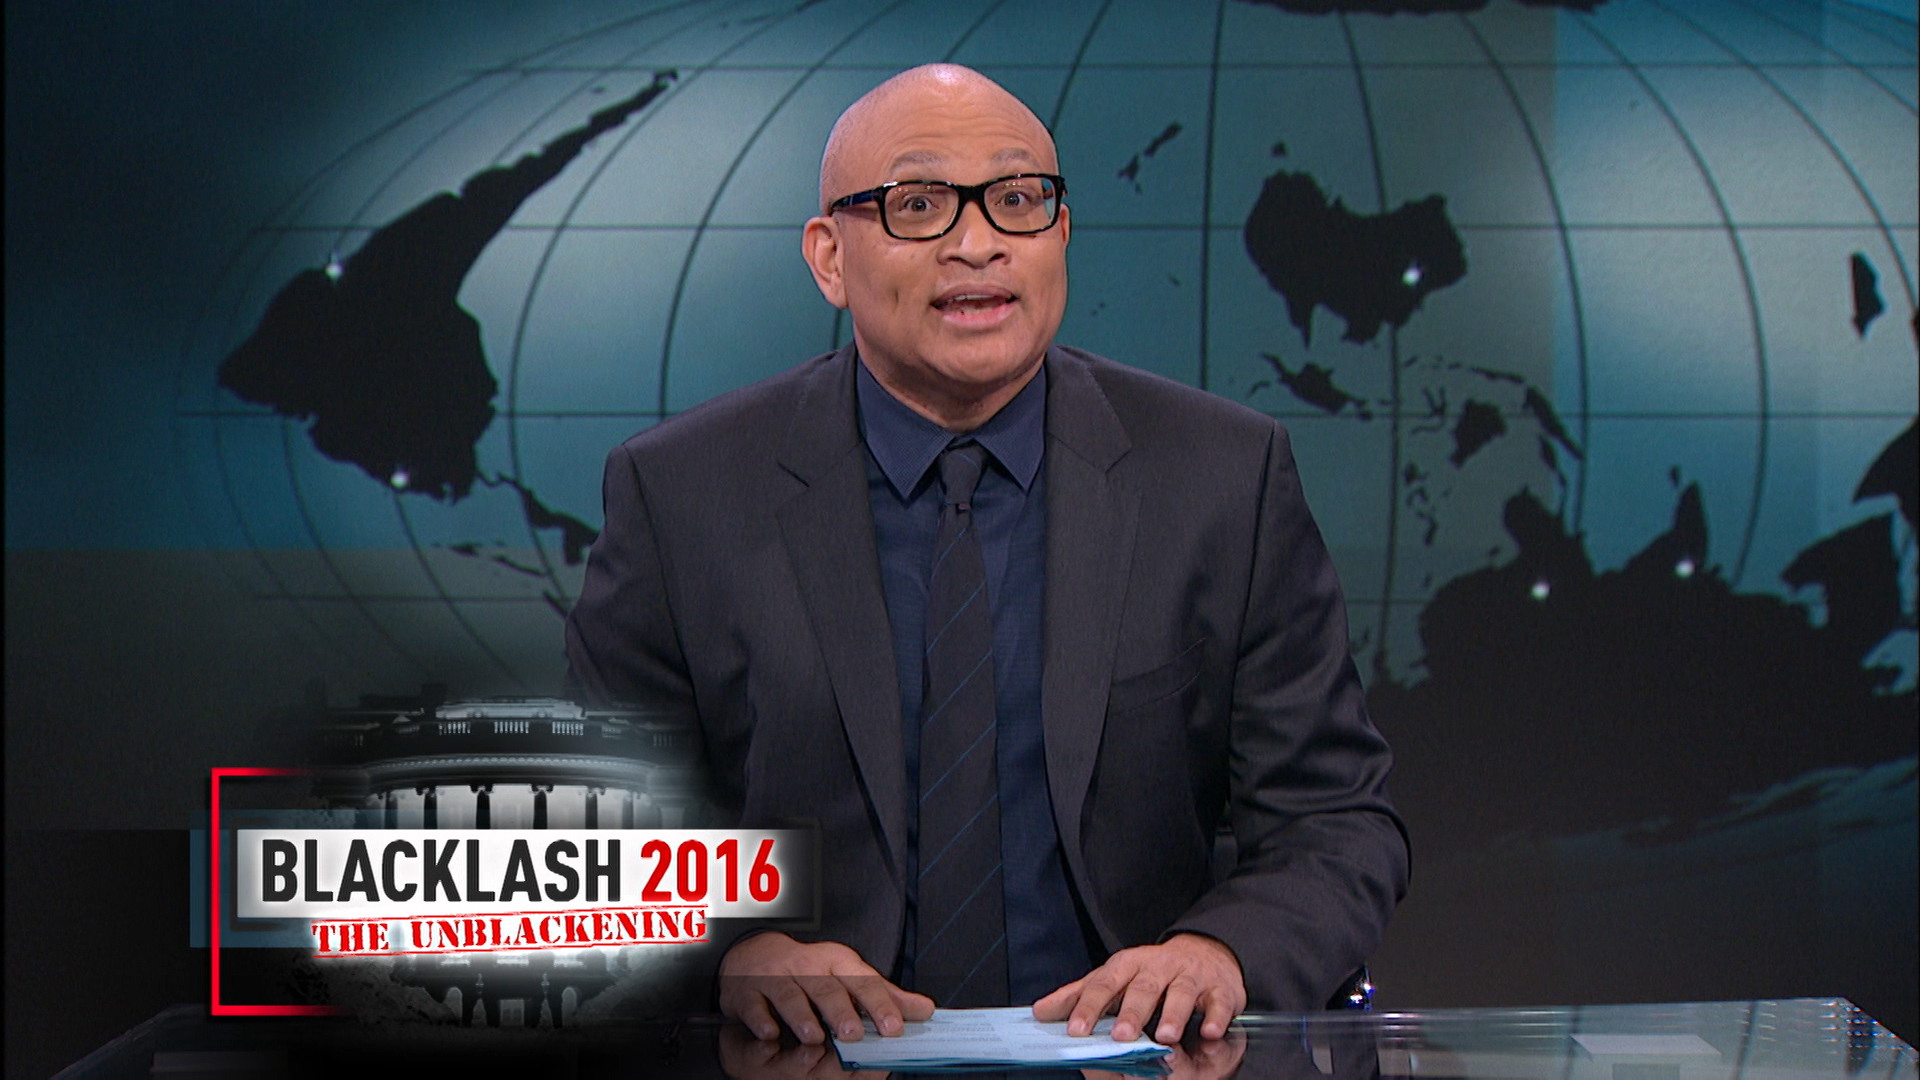 March 24, 2015 - Ted Cruz's Presidential Run